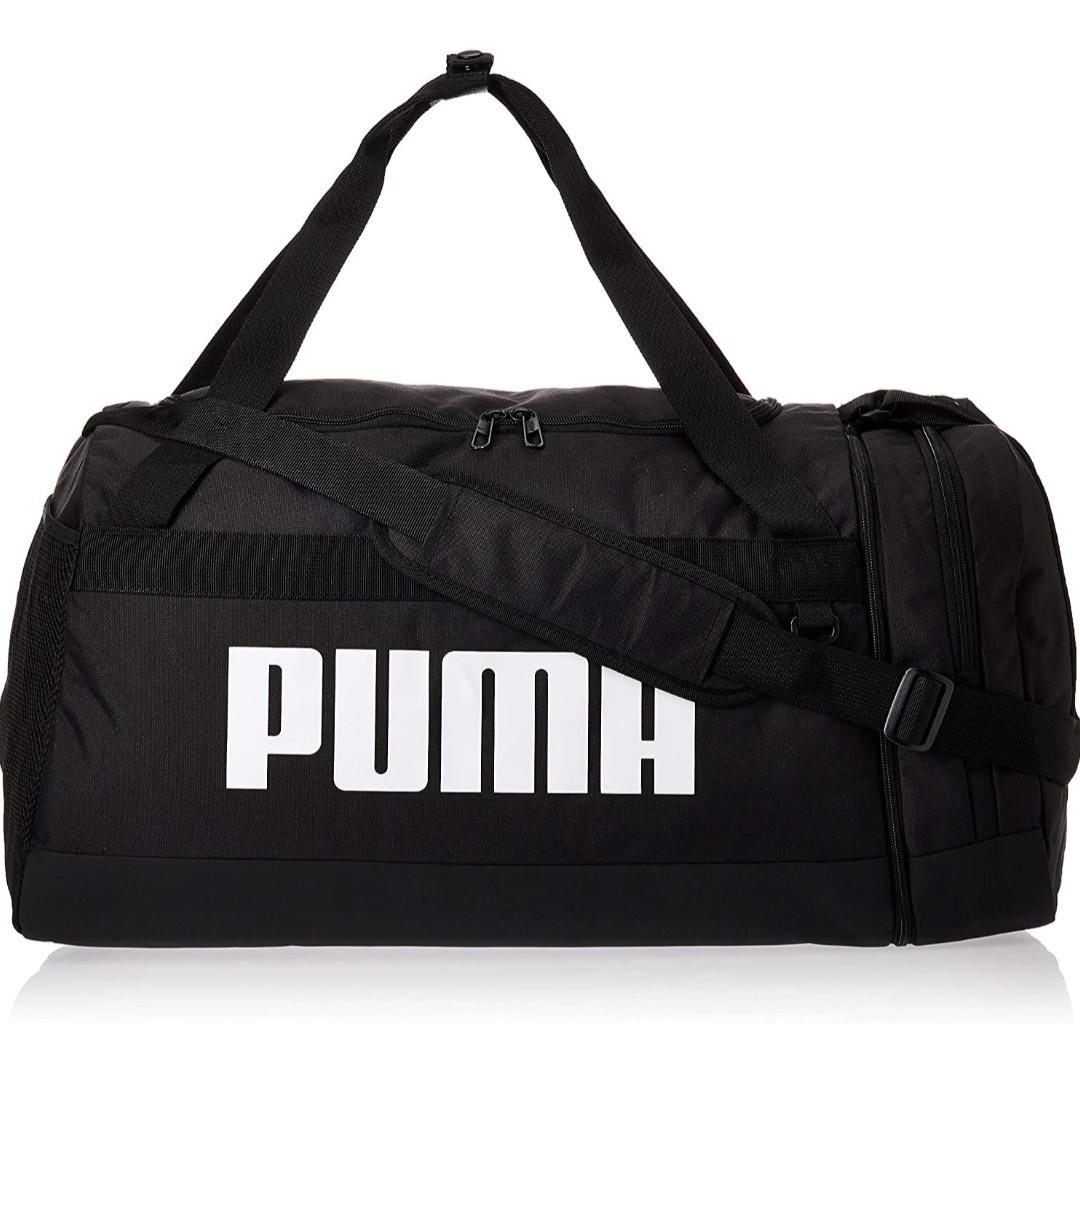 Sac de sport Puma Challenger M pro